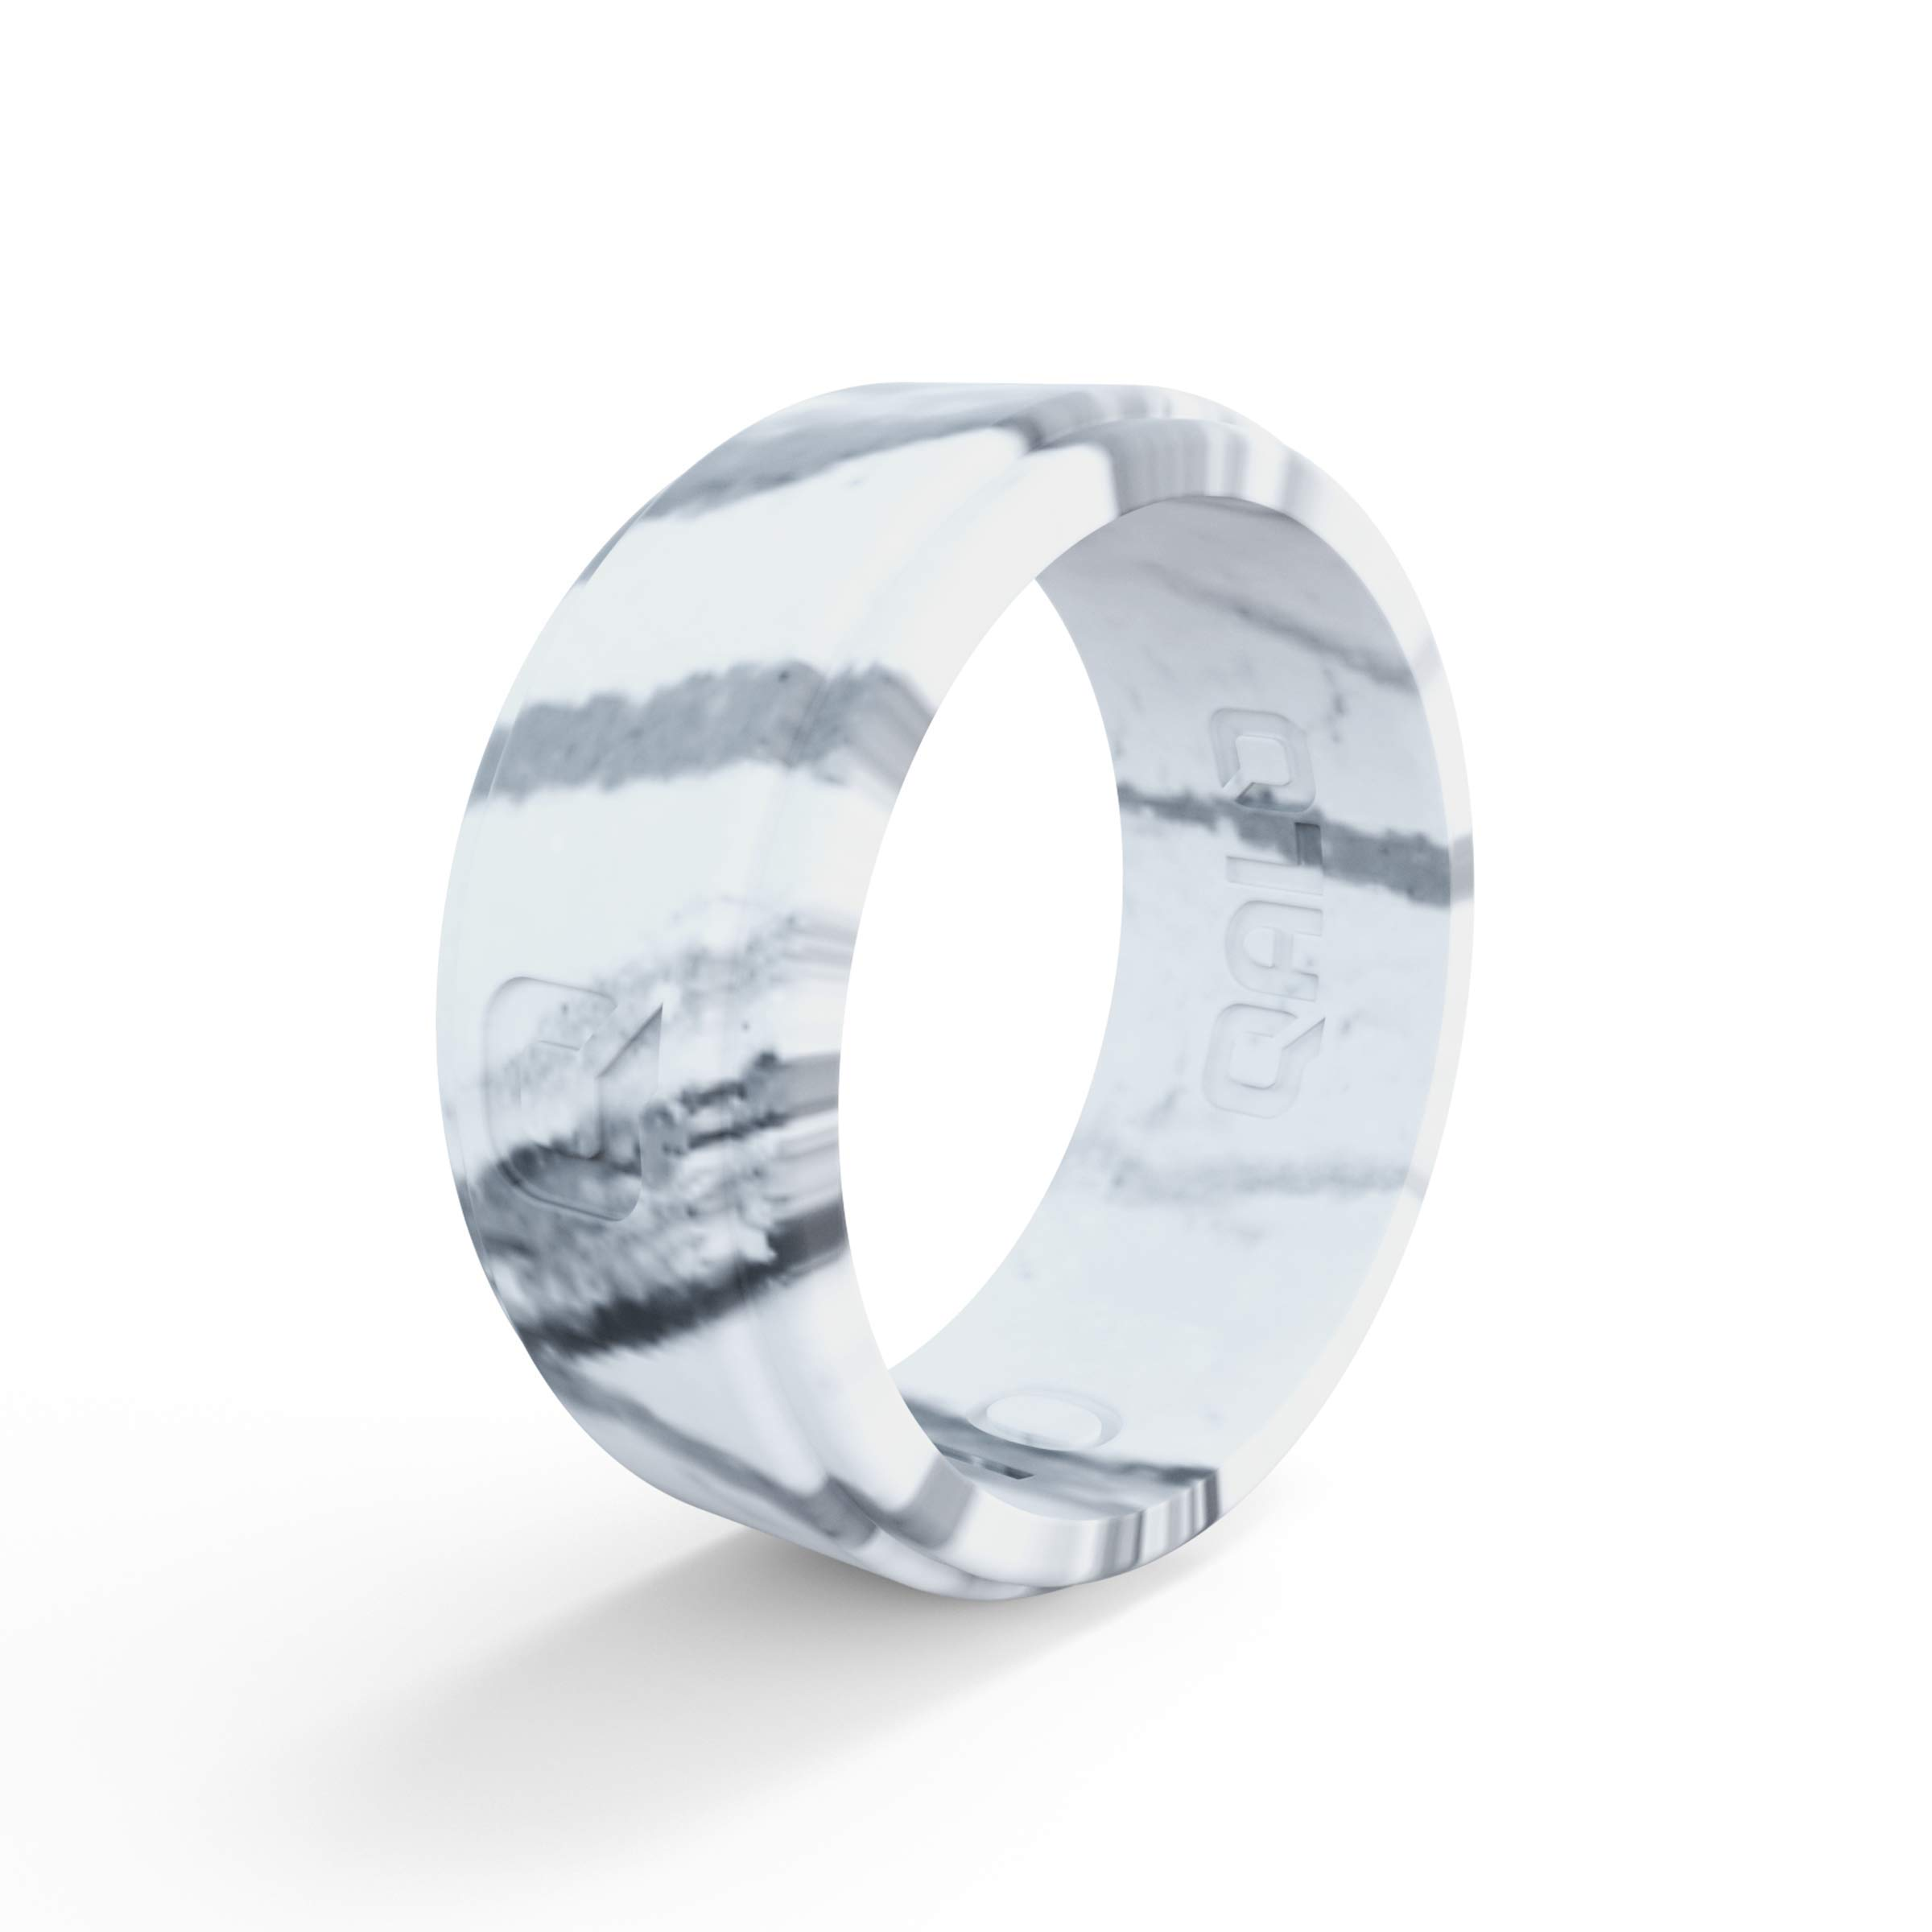 QALO Men's White Marble Step Edge Silicone Ring Size 08